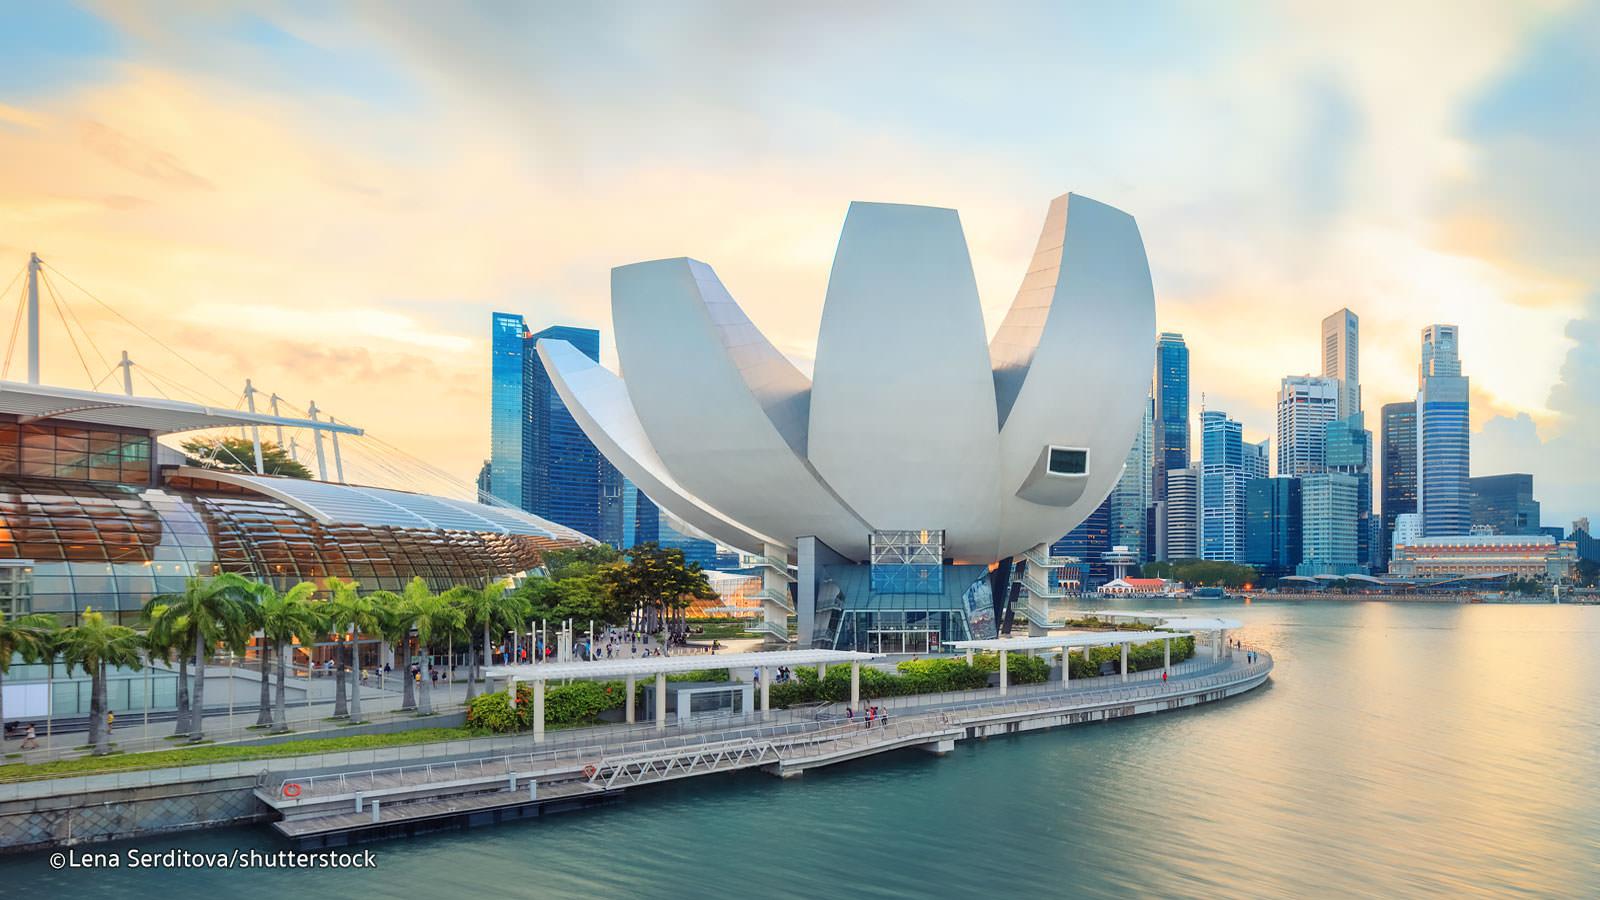 Art Sience Museum Singapore - Destinasi Wajib Dikunjungi Di Singapura